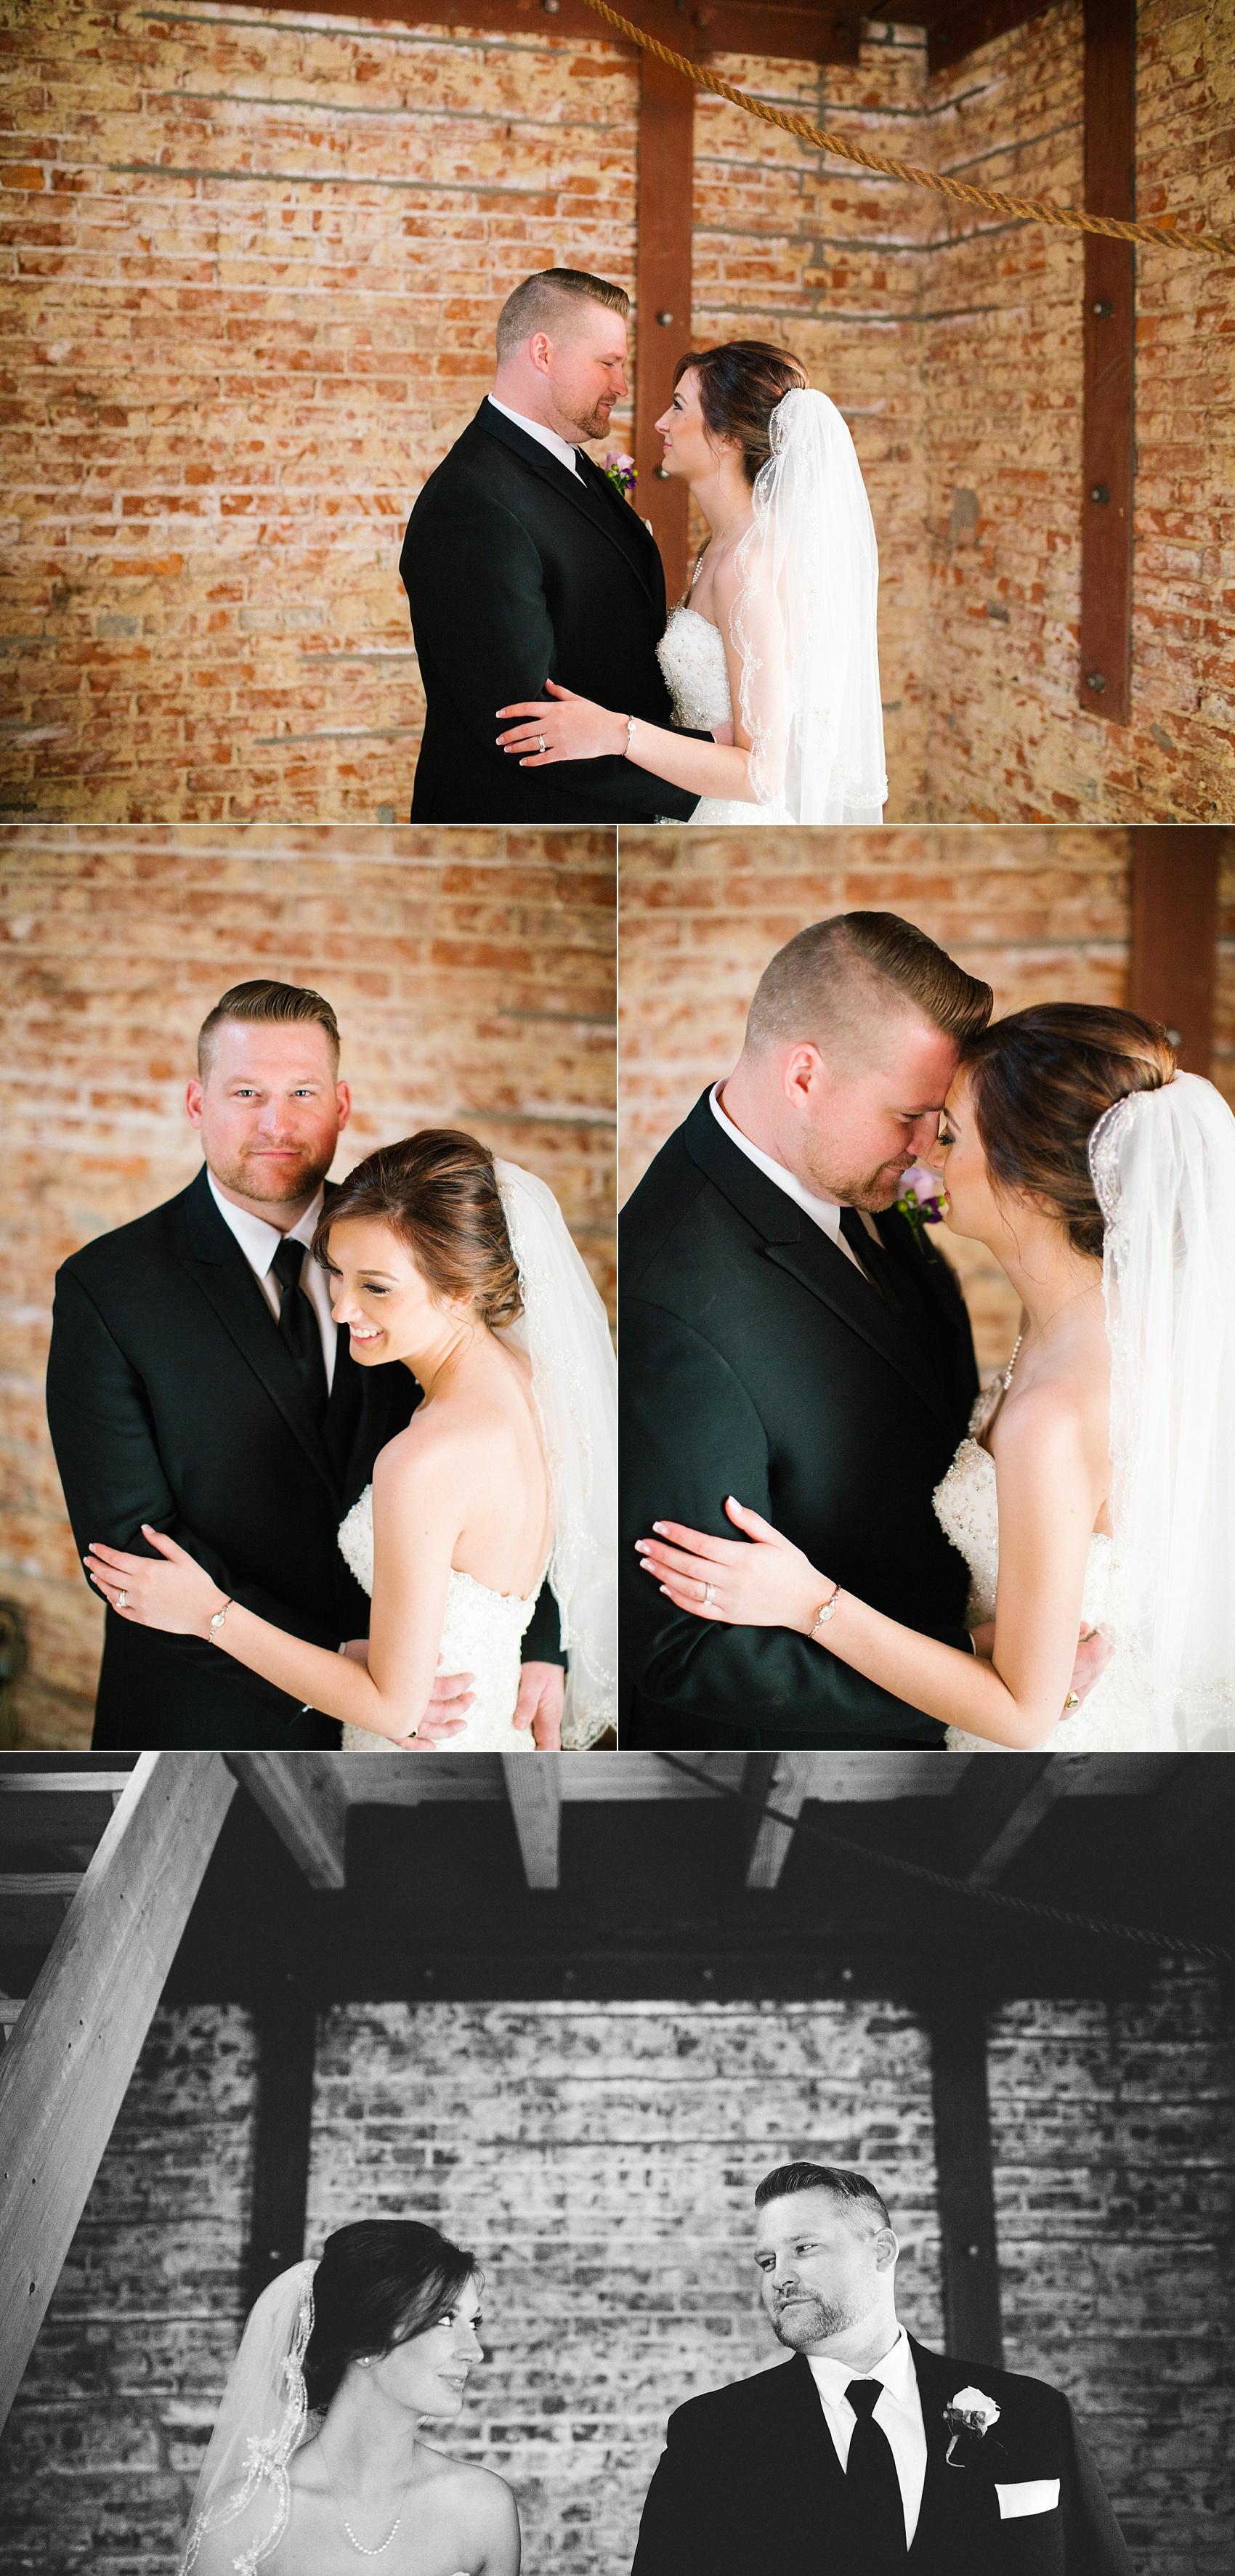 dwayne lydia delaware wedding philadelphia baltimore washingtion dc wedding photographer-17